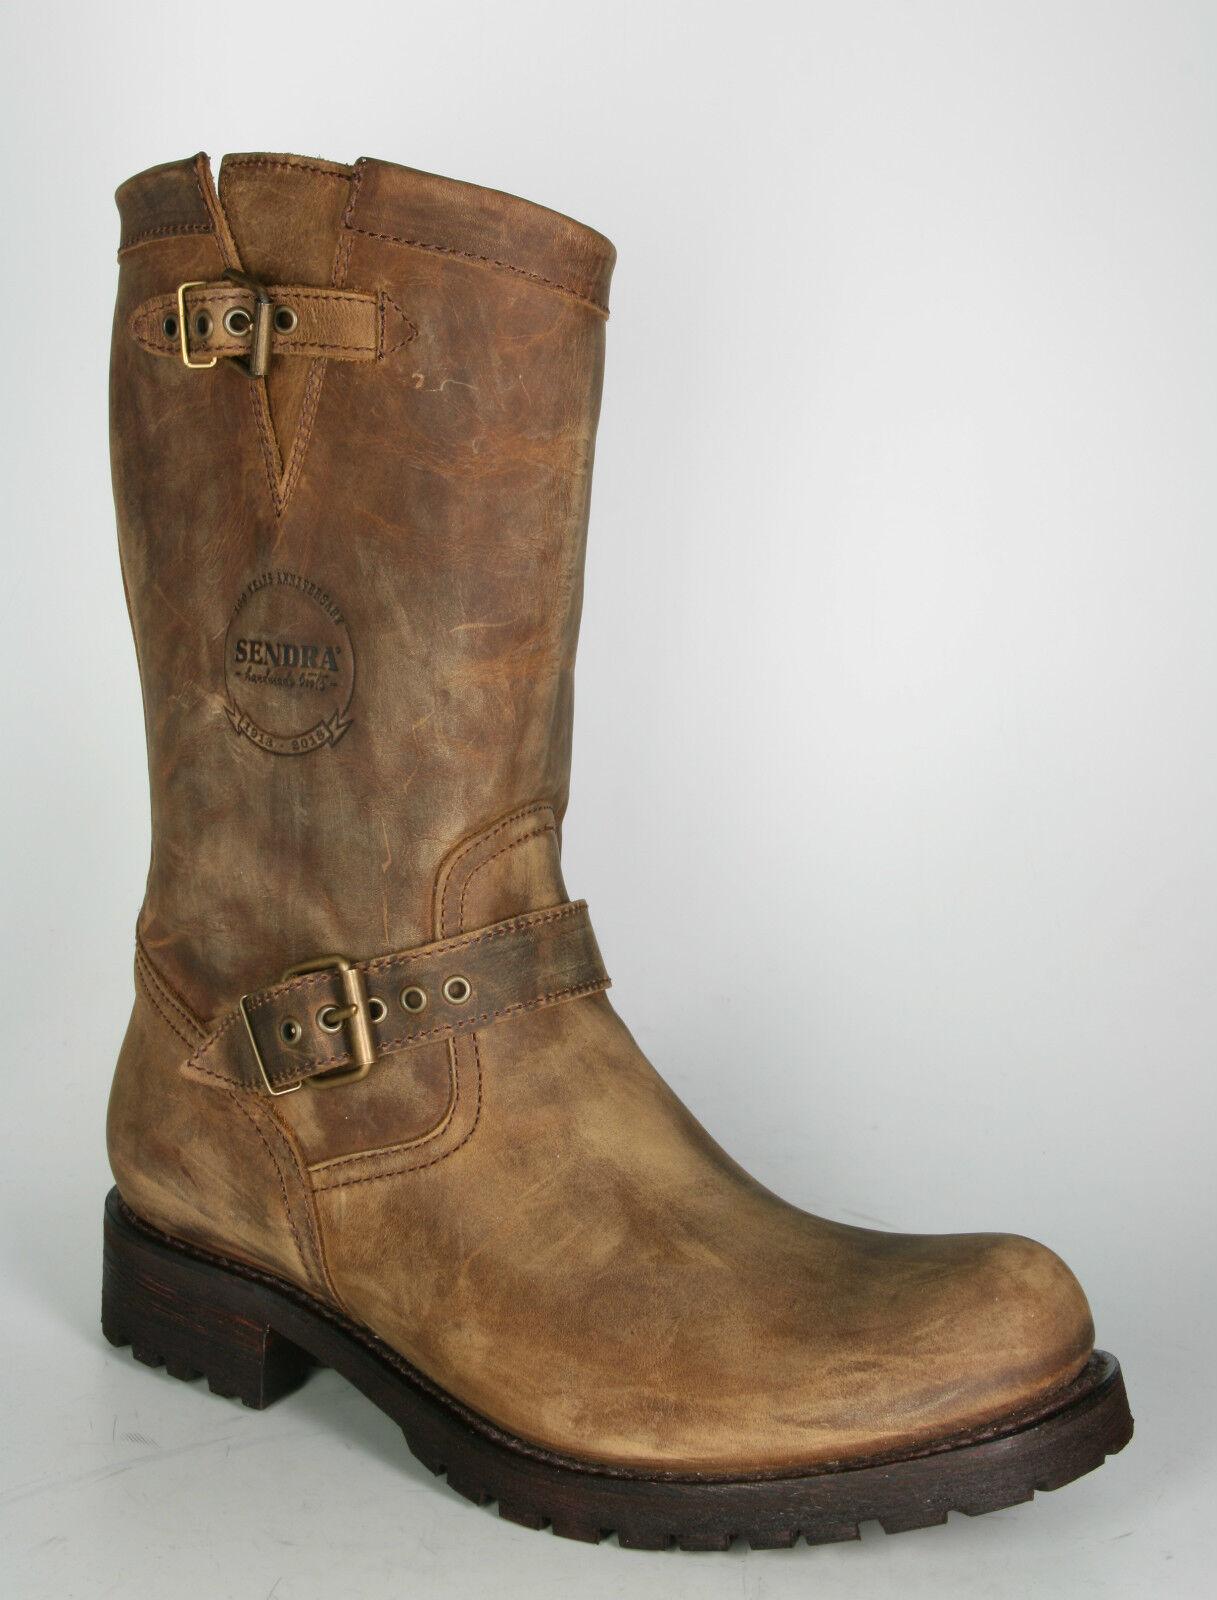 13416 Sendra Boots Engineer Mighty Lavado Braun